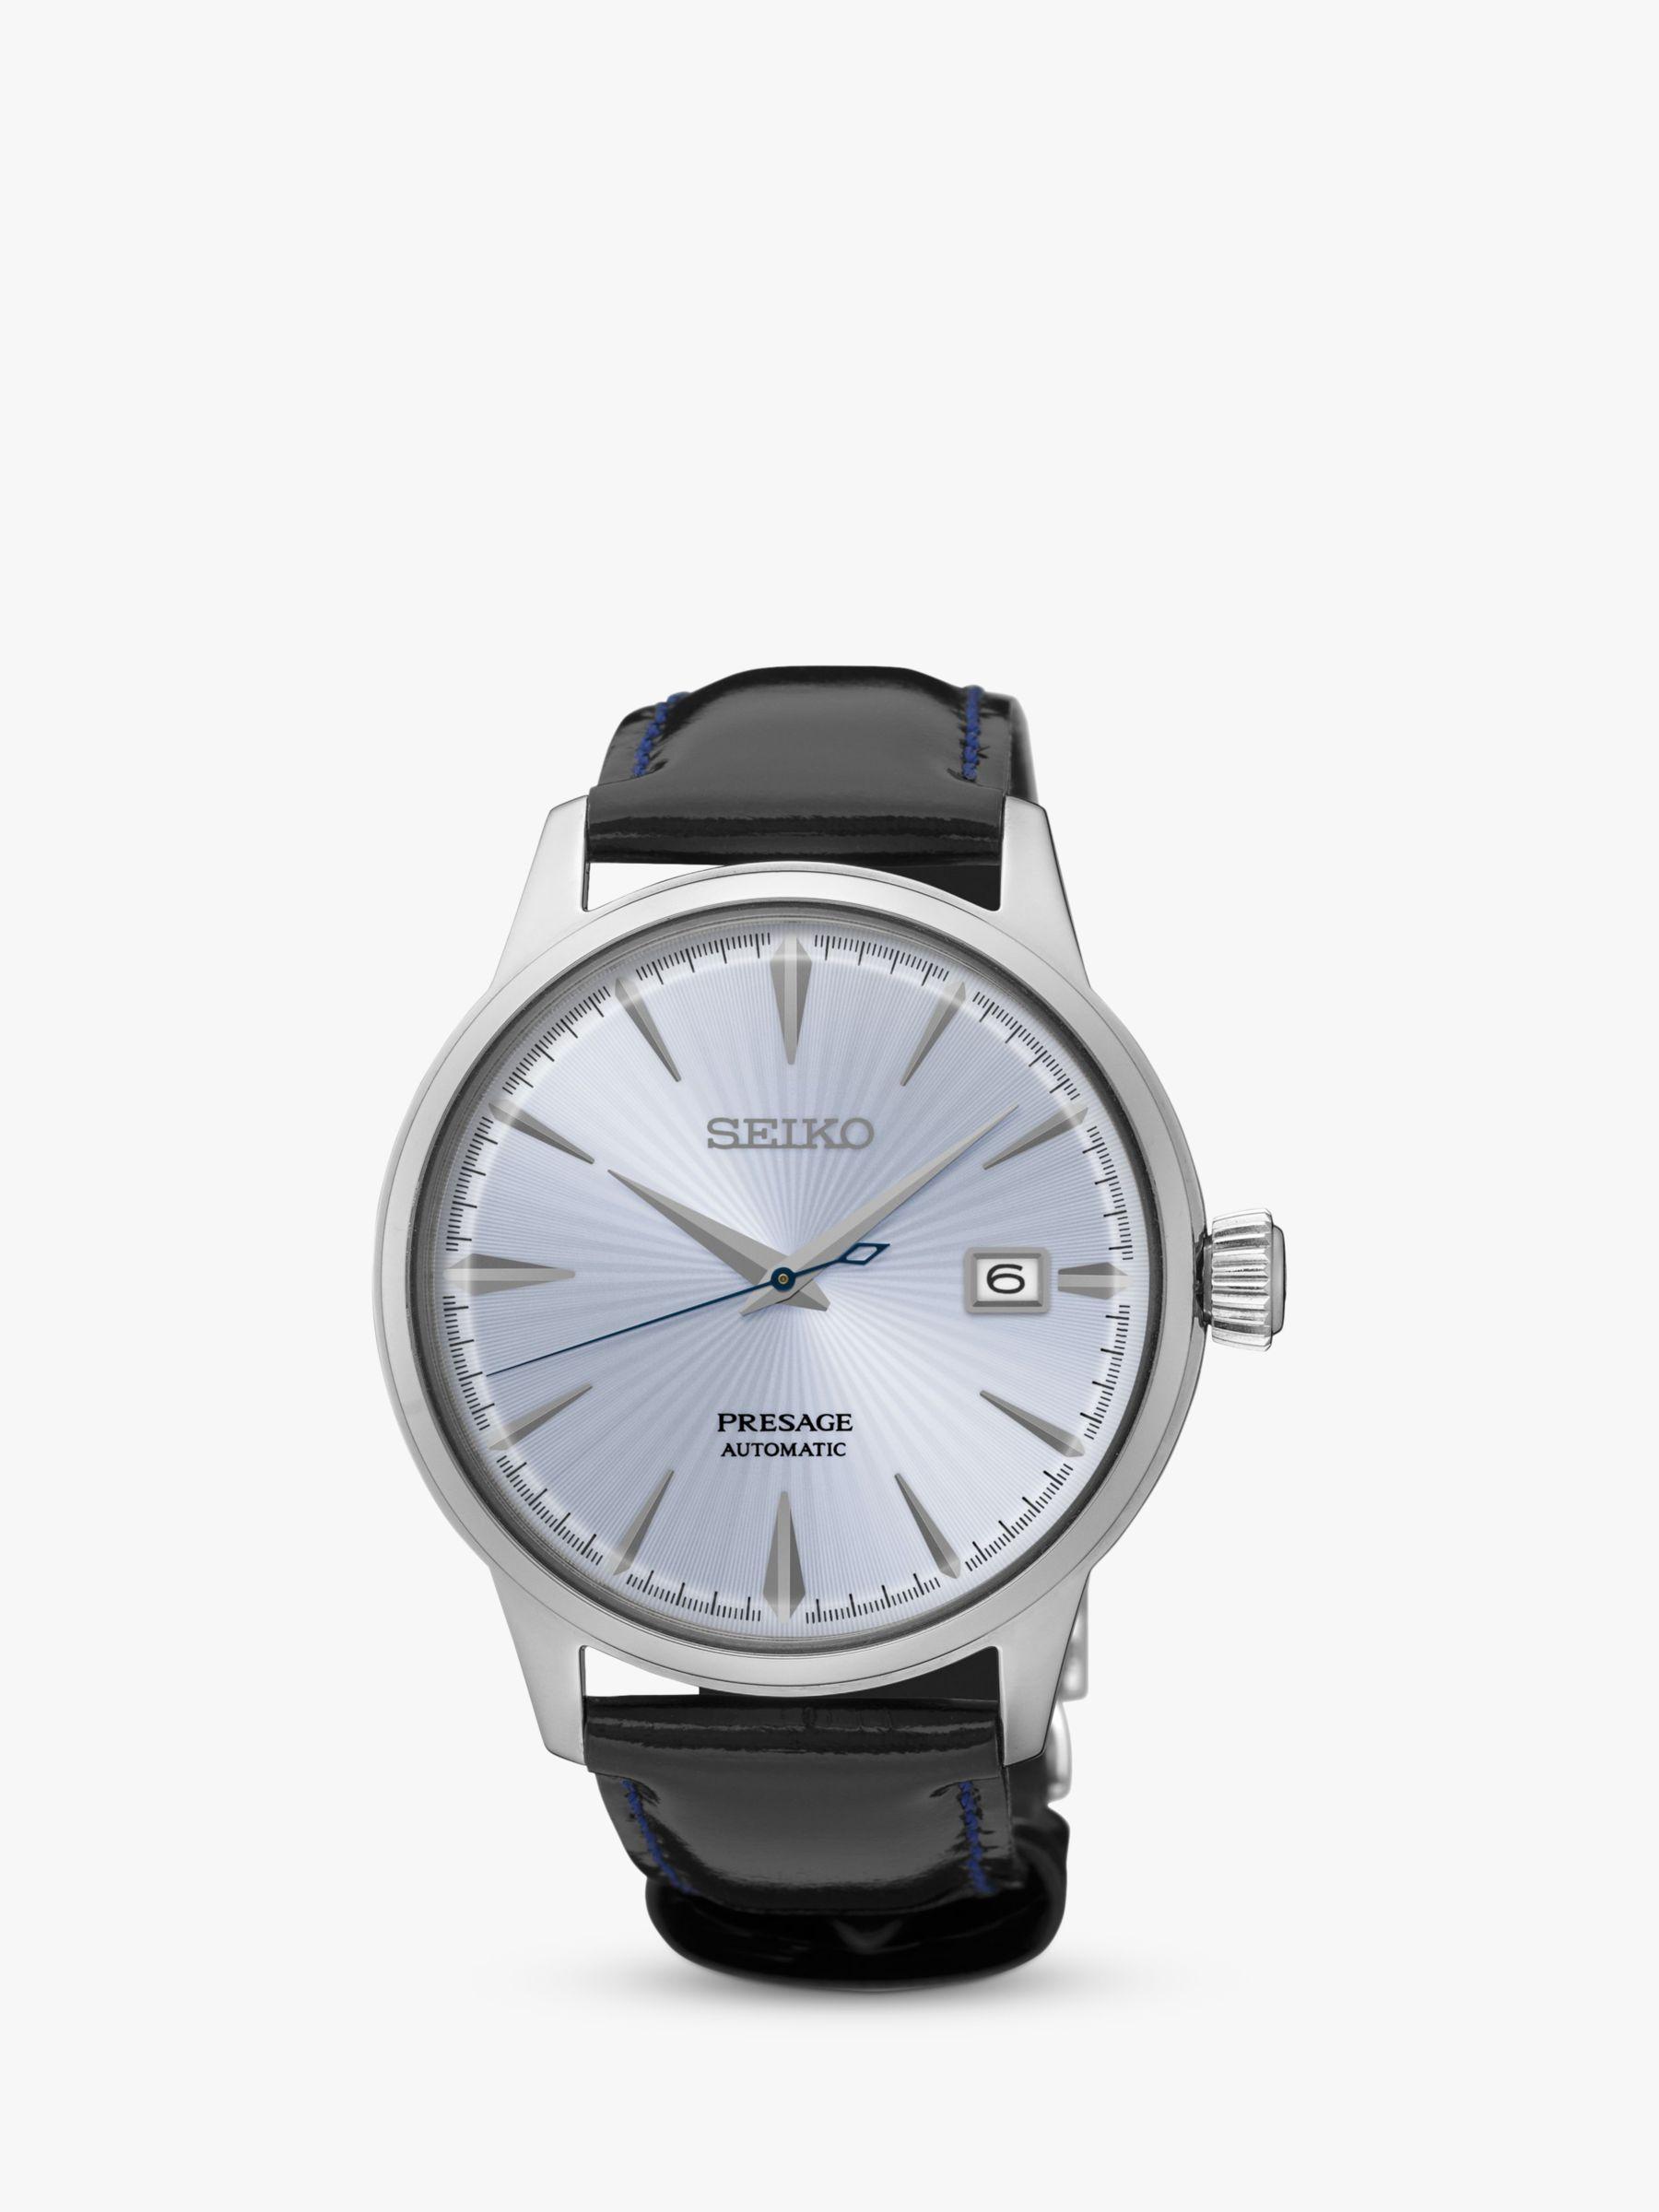 Seiko Seiko Men's Presage Automatic Date Leather Strap Watch